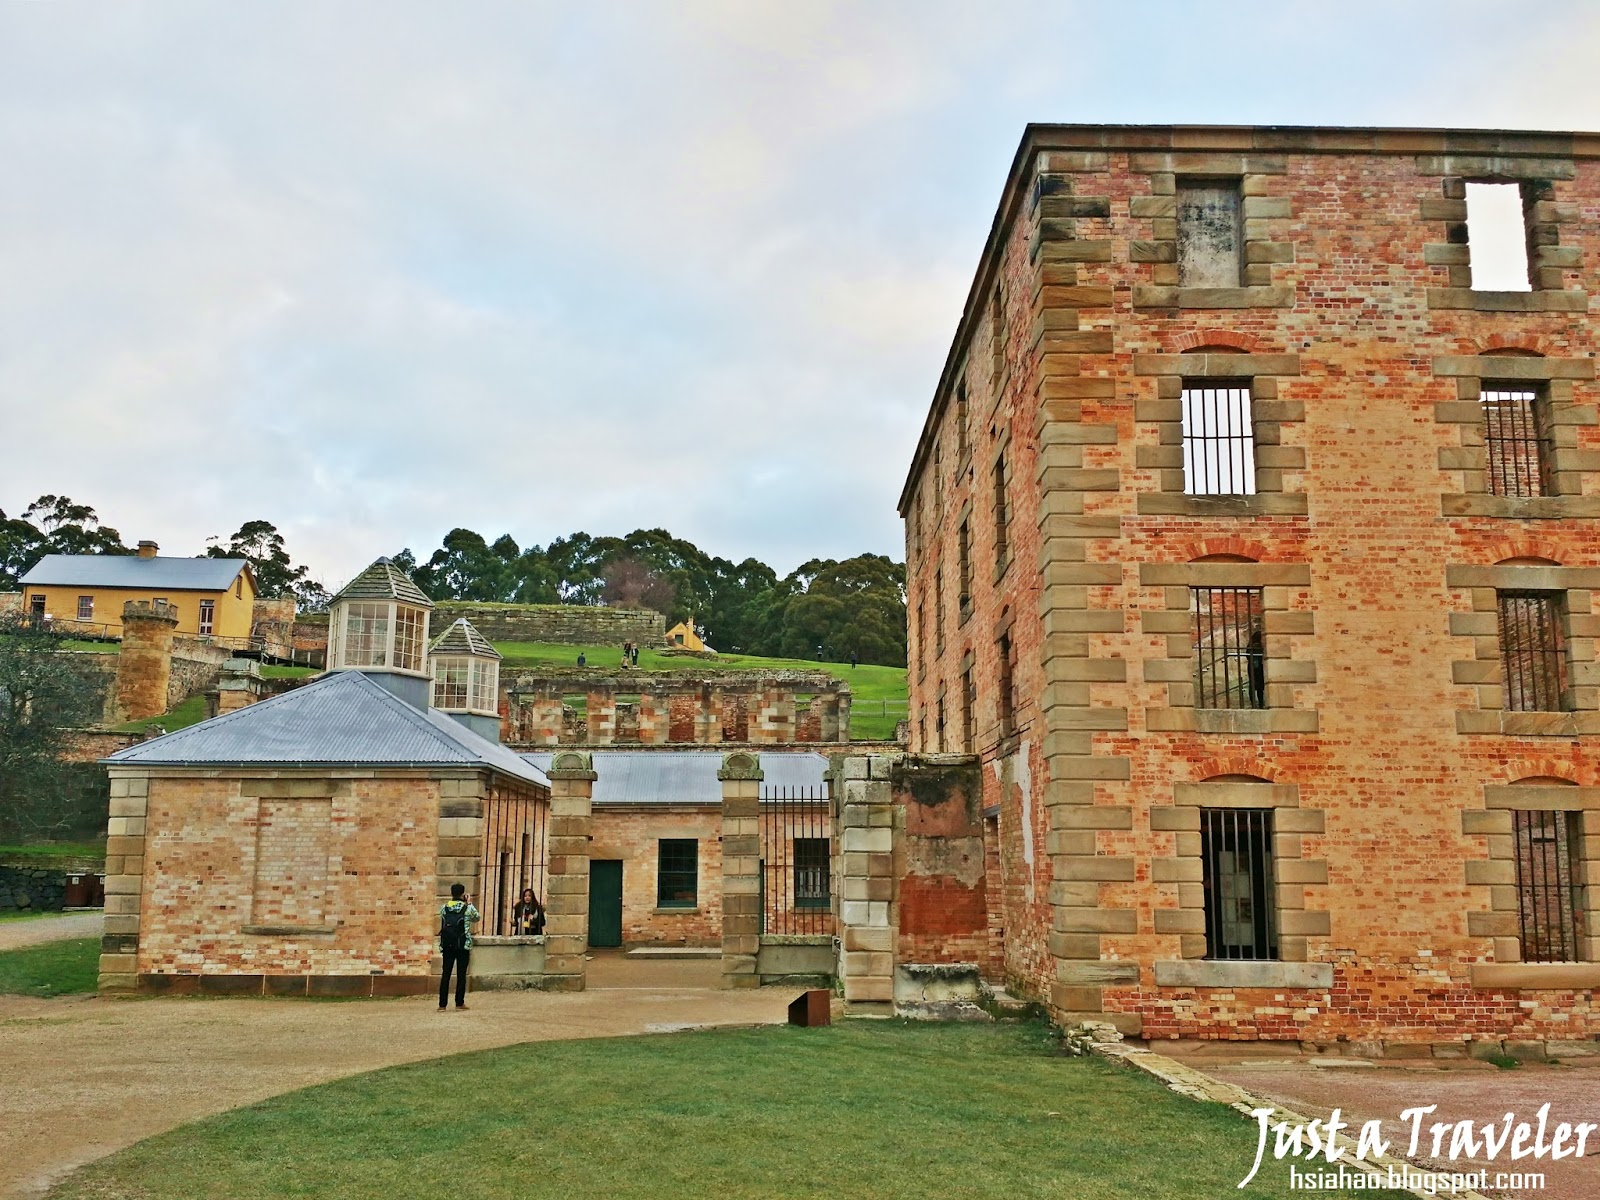 塔斯馬尼亞-荷伯特-景點-推薦-亞瑟港-旅遊-自由行-澳洲-Tasmania-Hobart-Port-Arthur-Tourist-Attraction-Australia